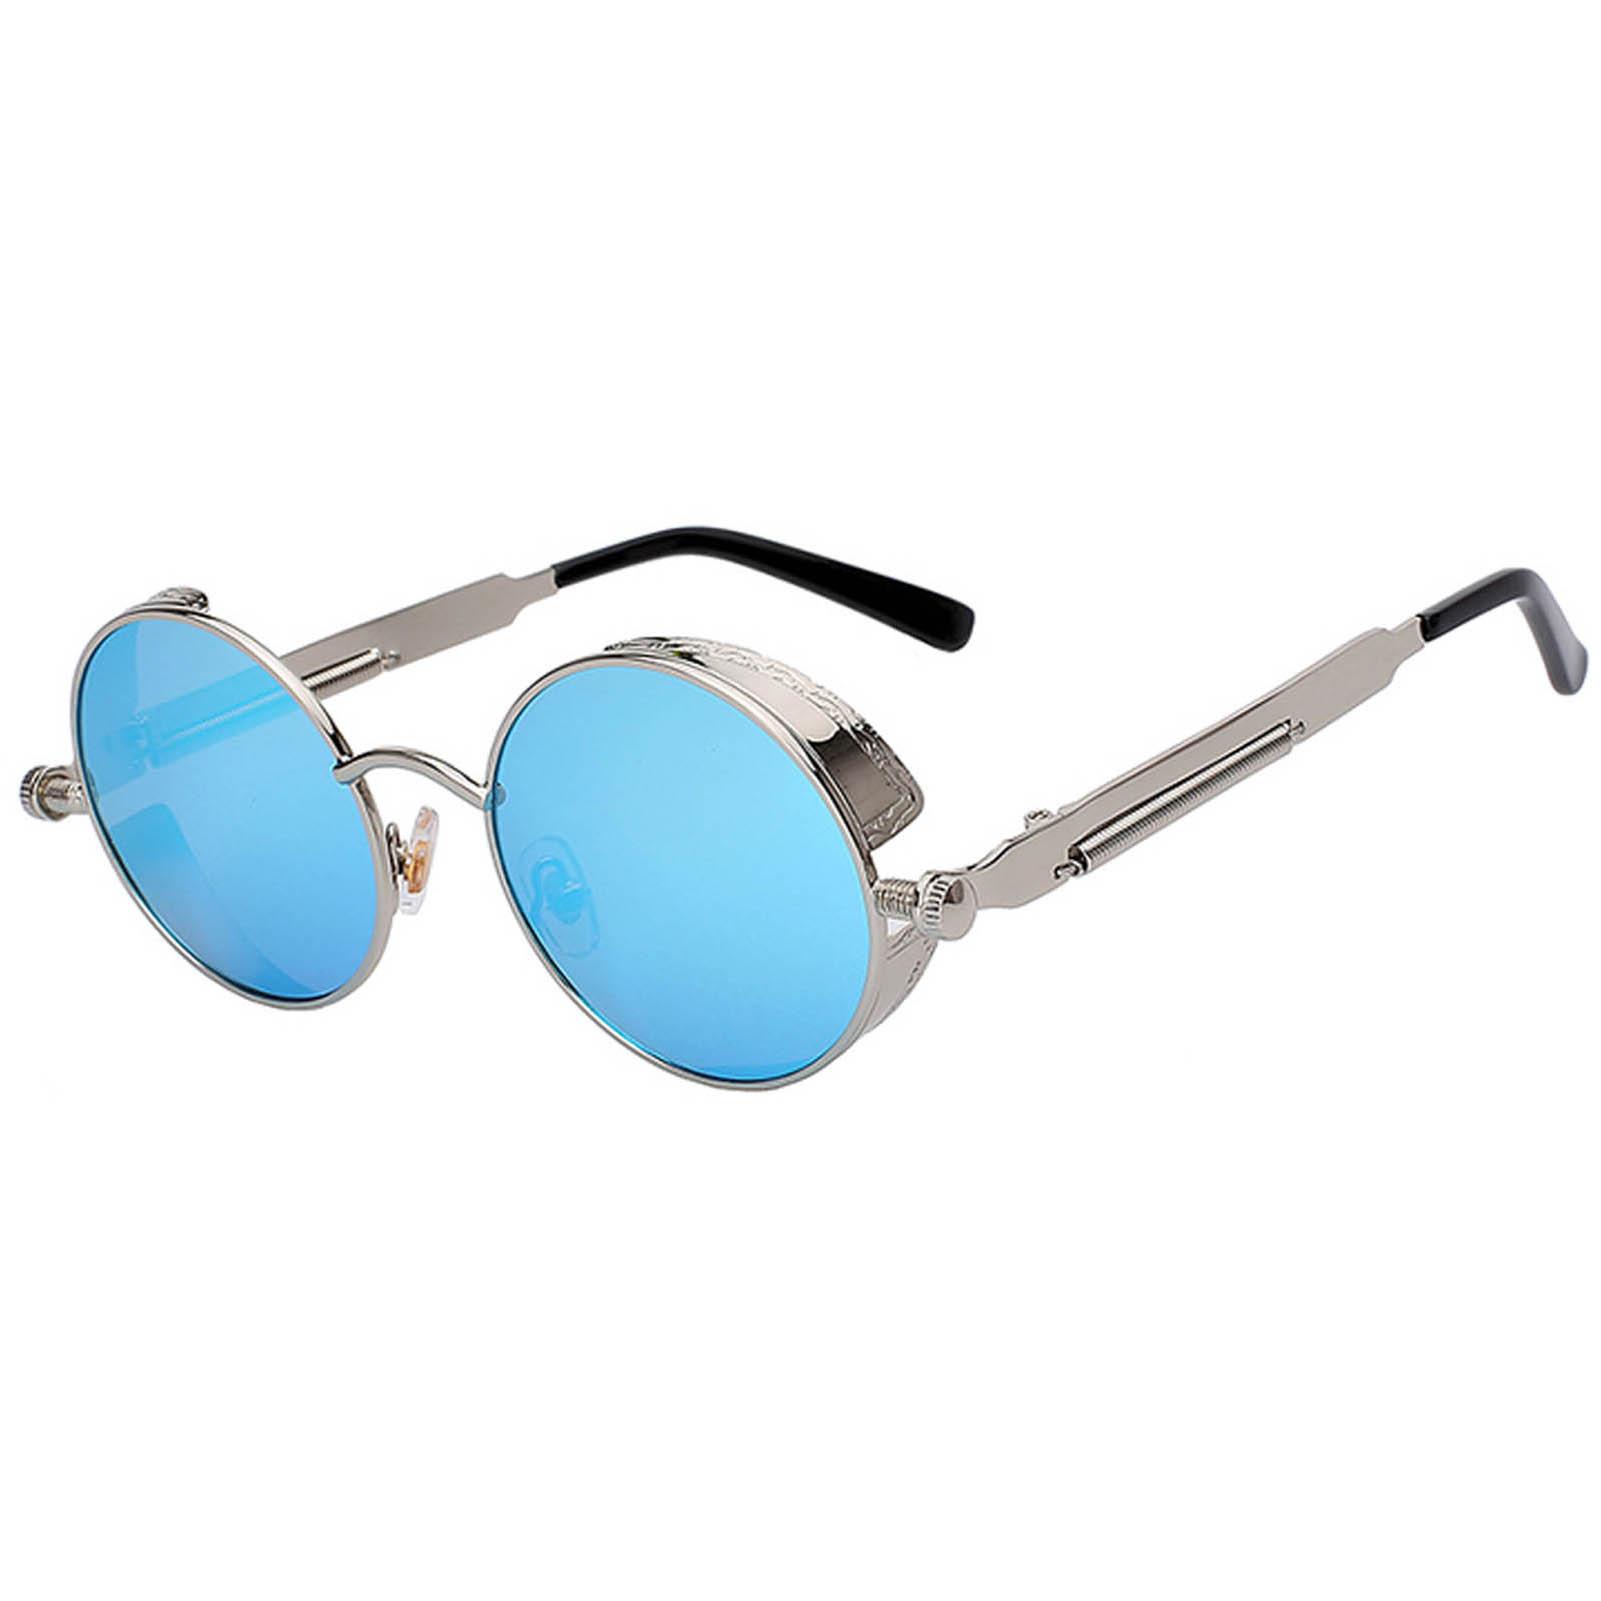 OWL ® Steampunk C6 Gothic Eyewear Sunglasses Women's Men's Metal Round Circle Silver Frame Blue Ice Mirror Lens One Pair